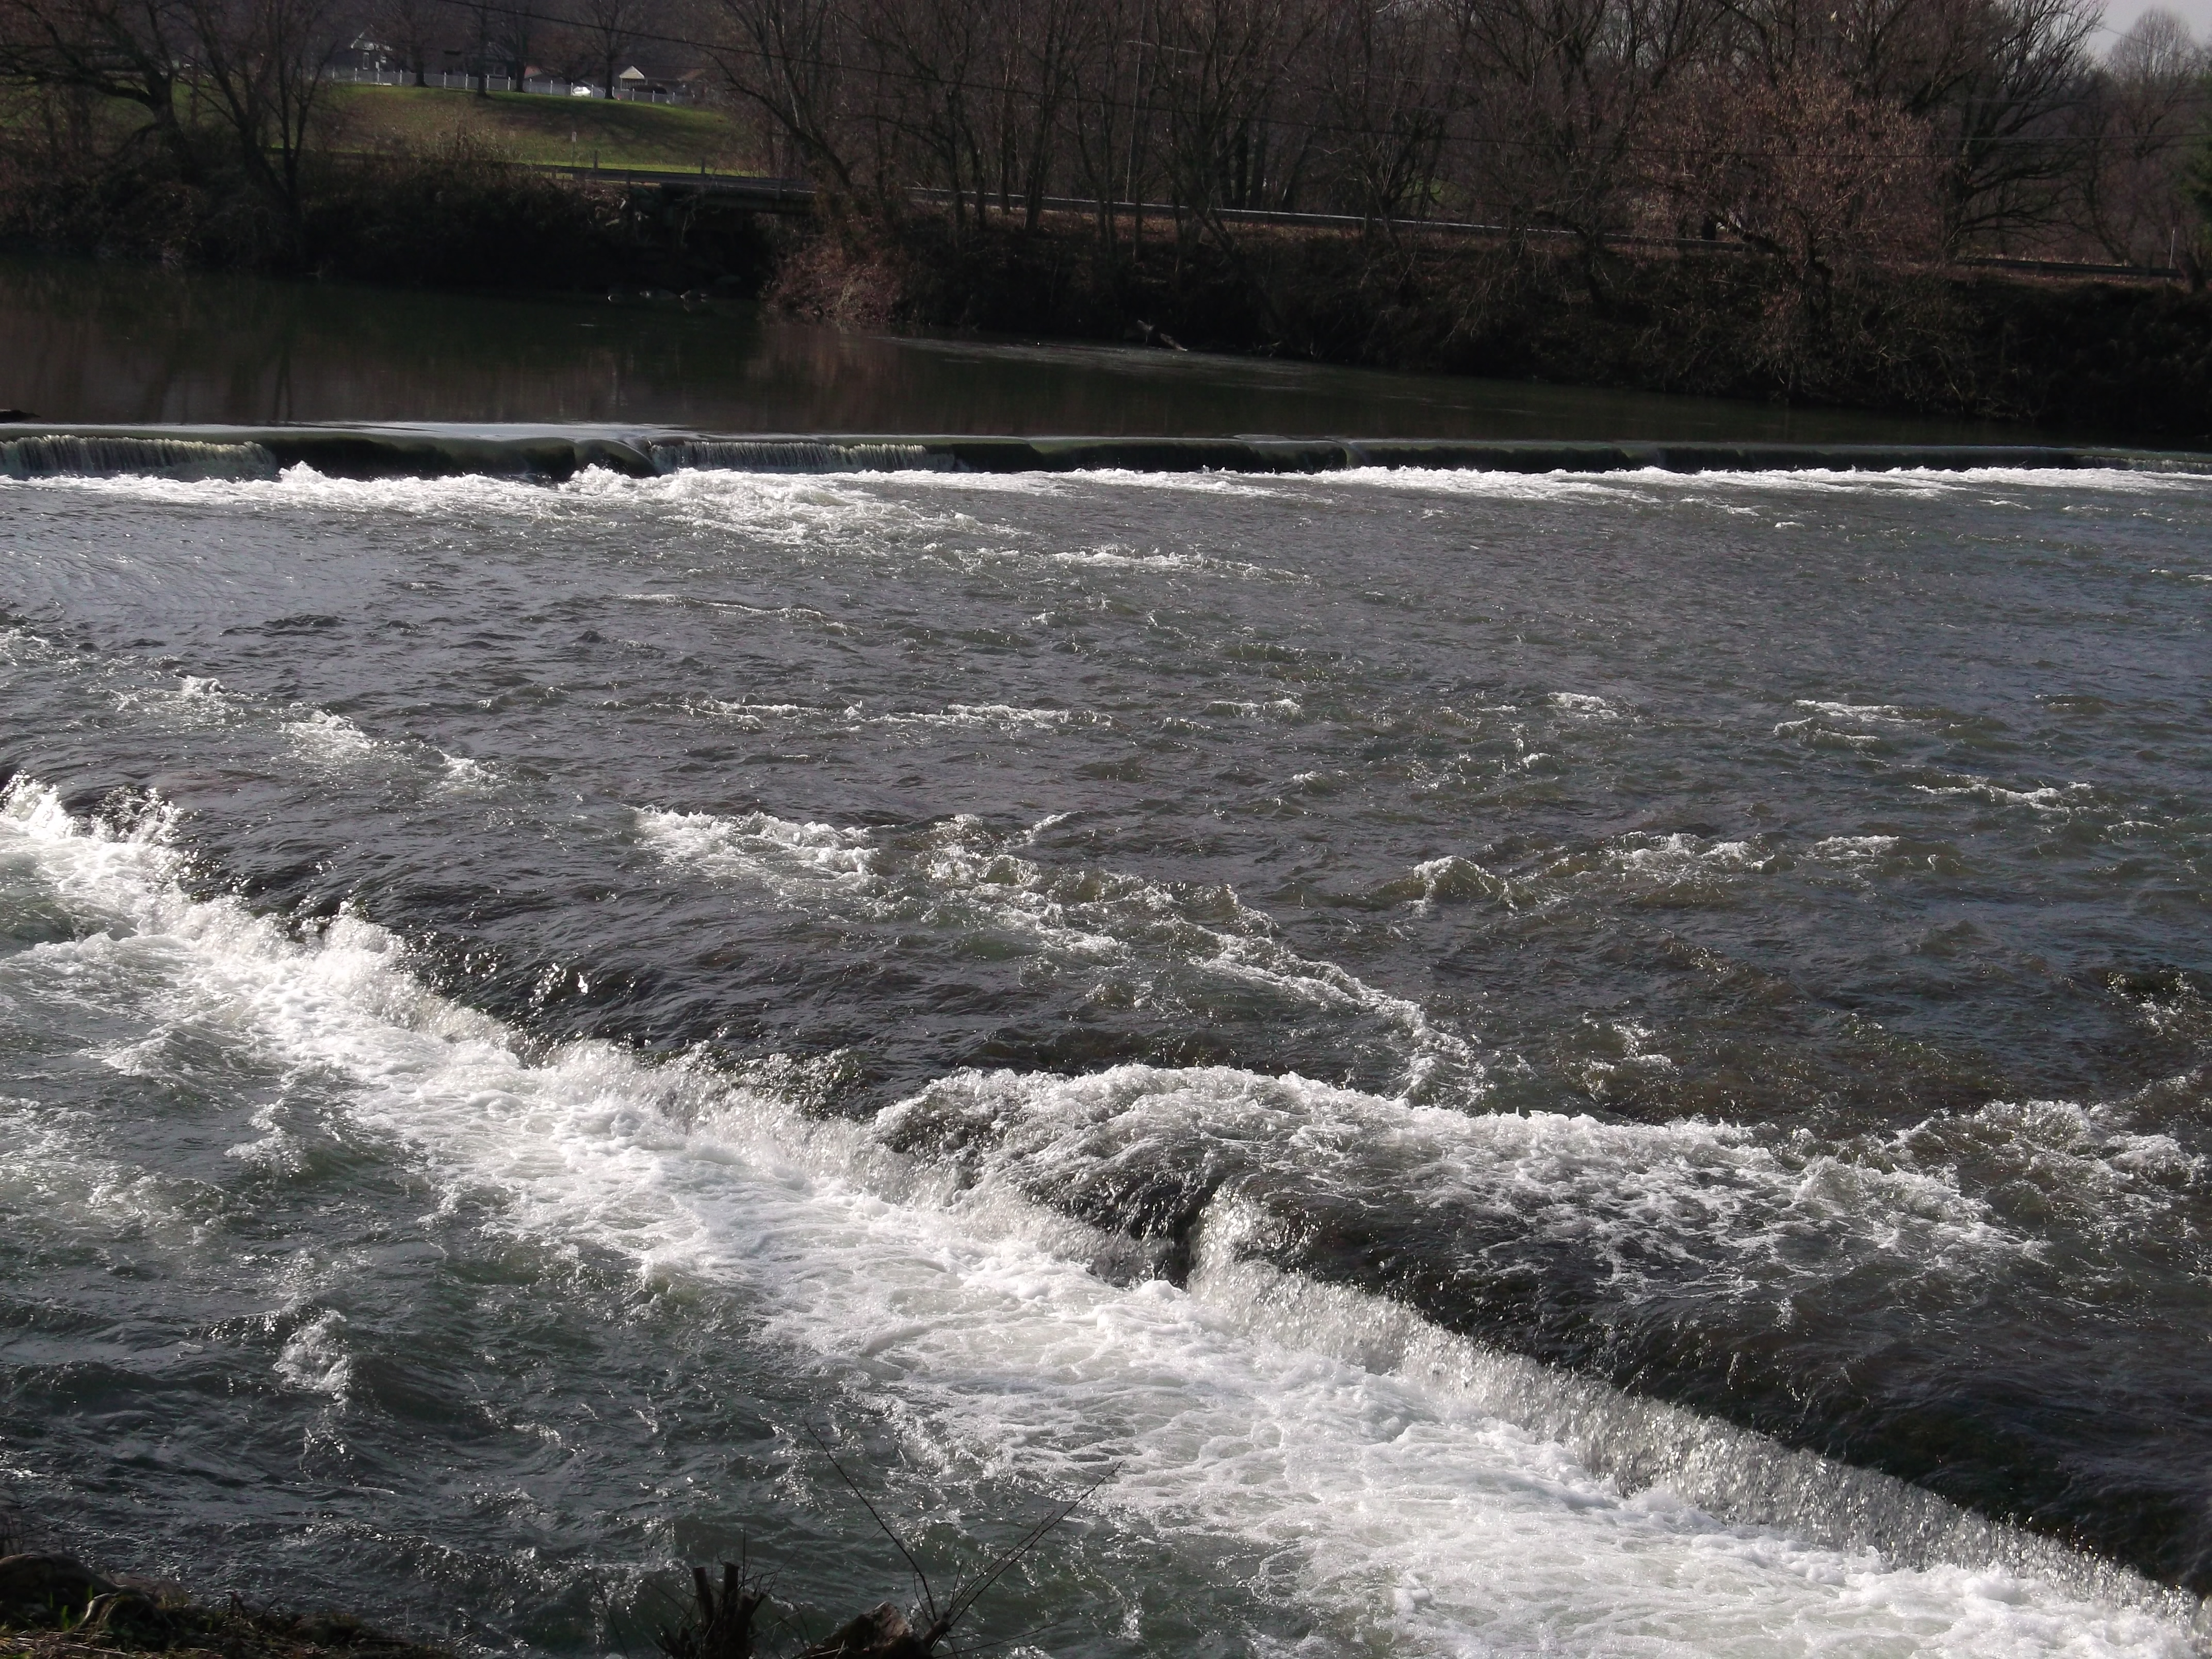 River Falls Virginia Coal River West Virginia